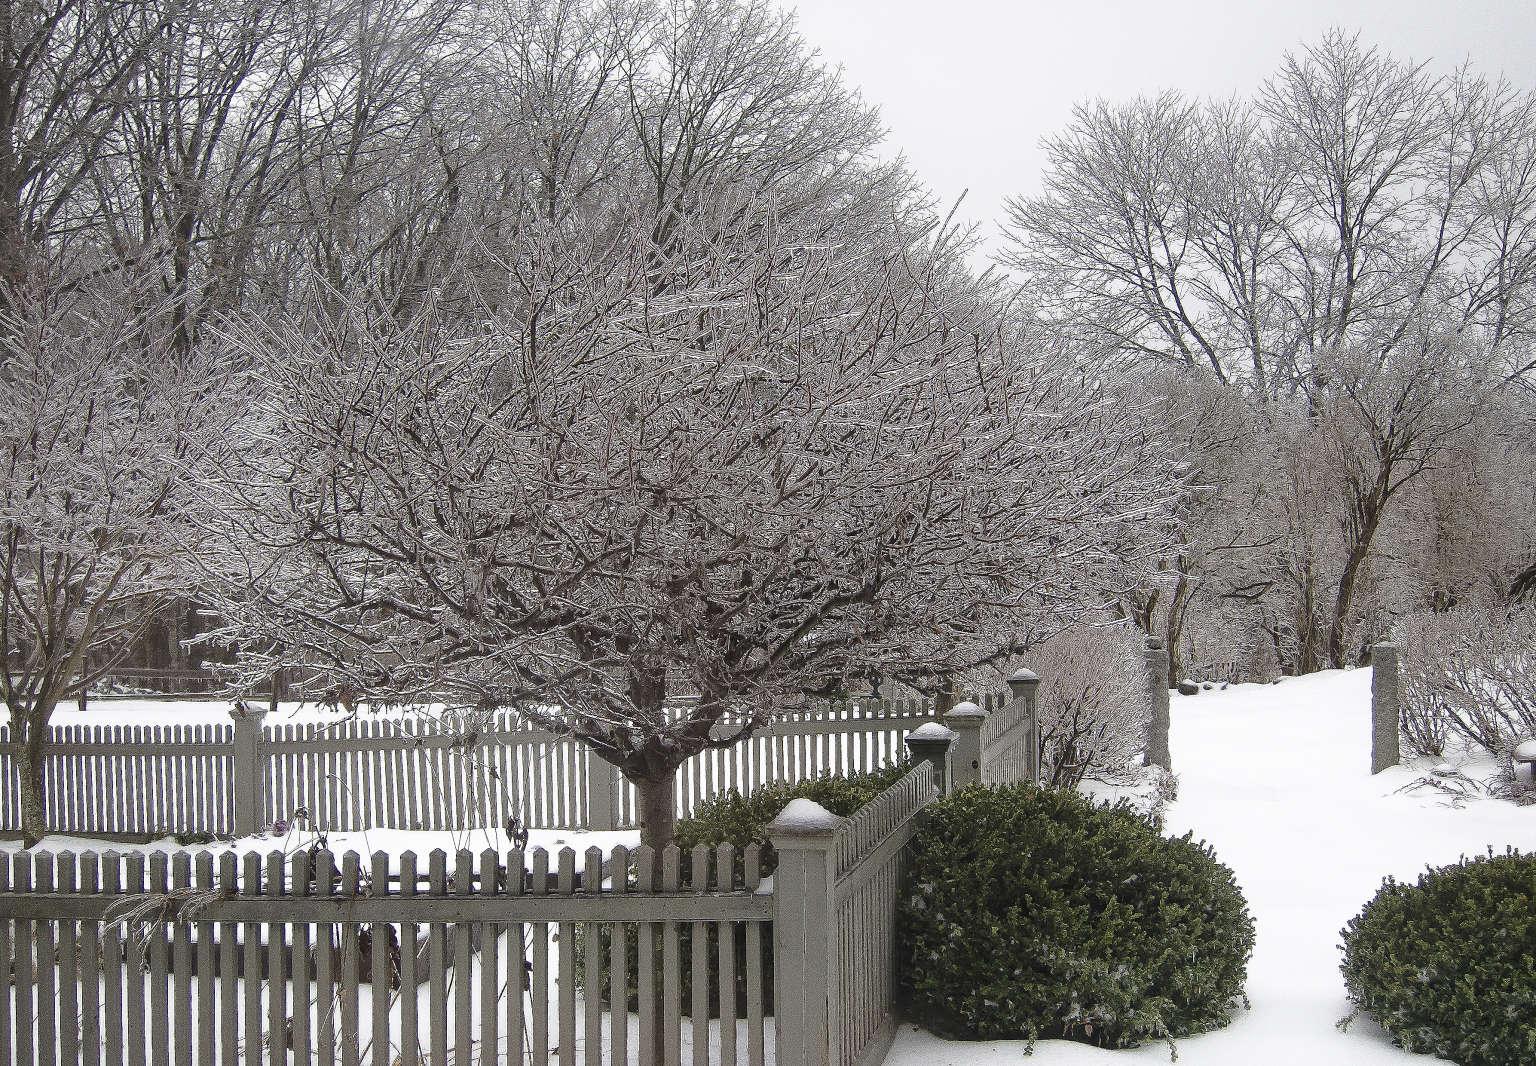 juniper hill winter garden picket fence snow joseph valentine 11